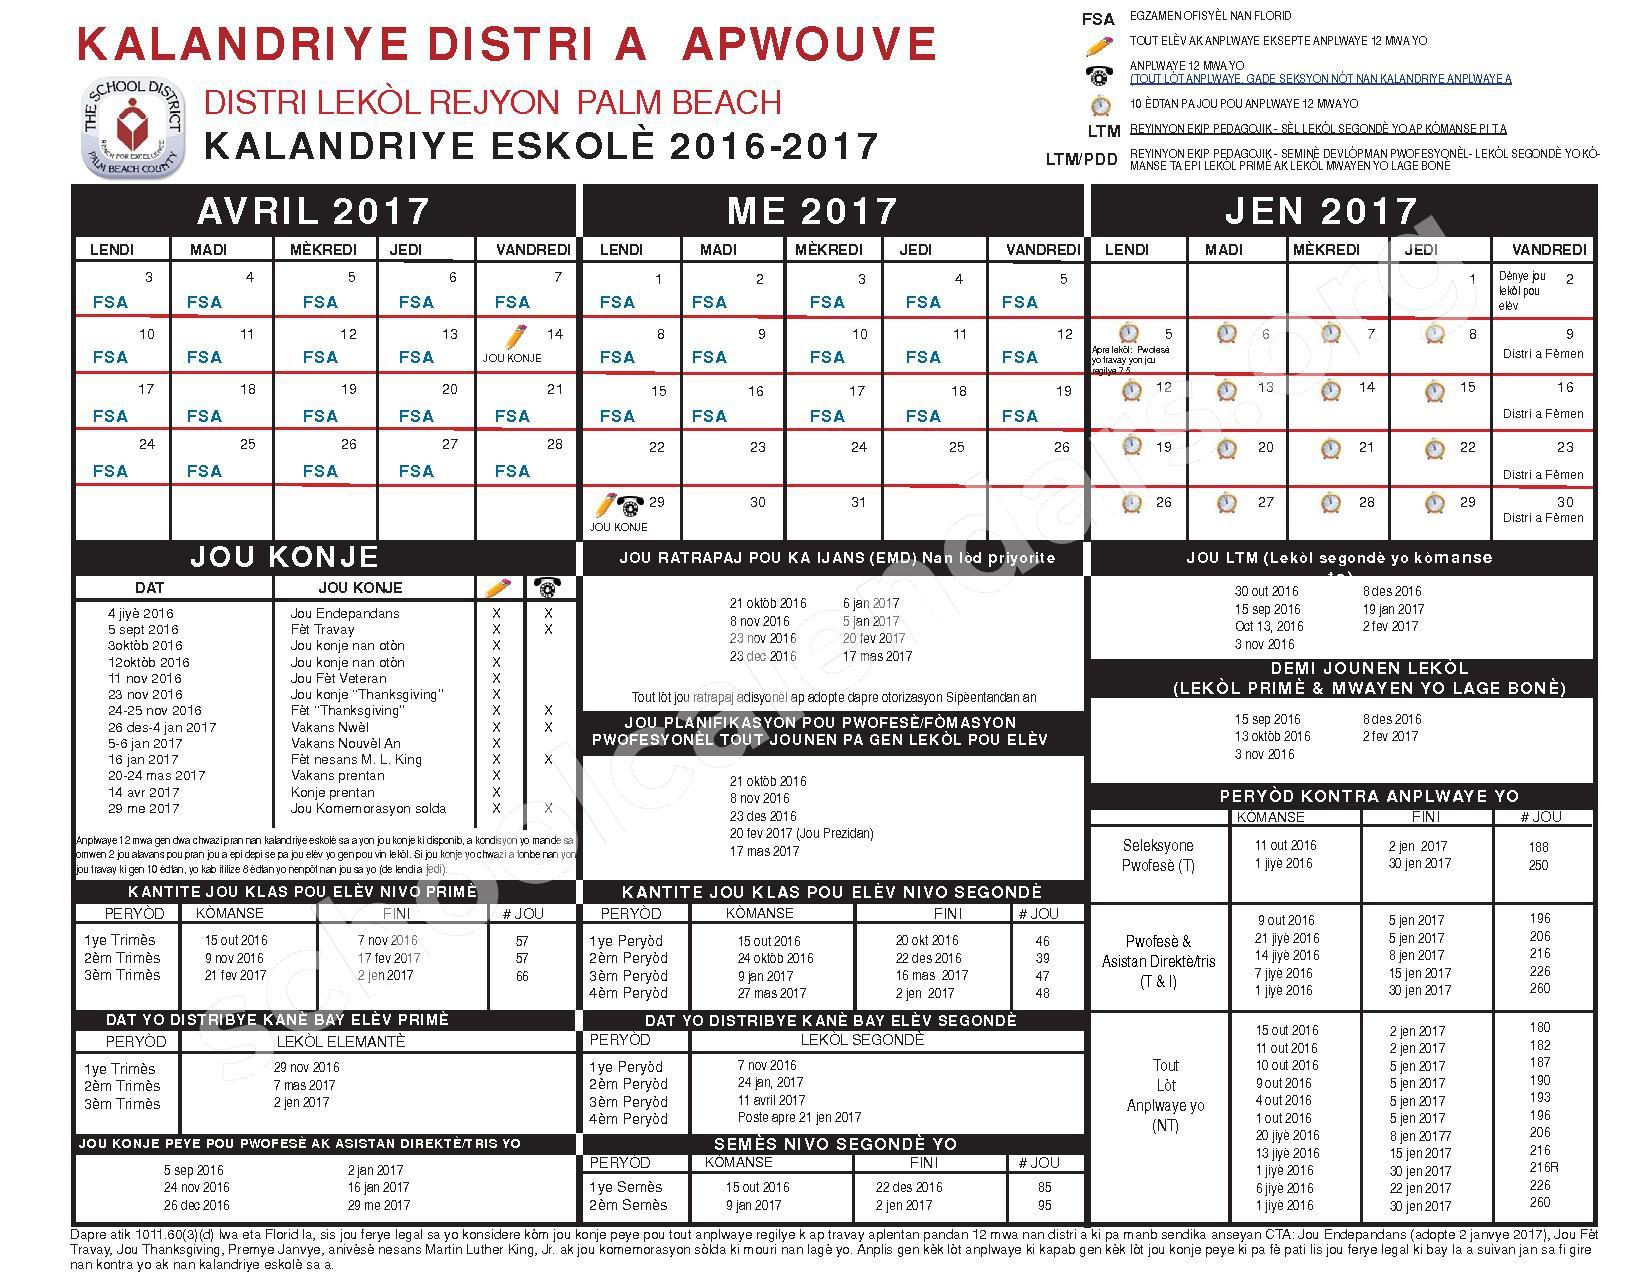 2016 - 2017 KALANDRIYE ESKOLÈ (Creole) – Secondary, Adult and Community Education – page 2